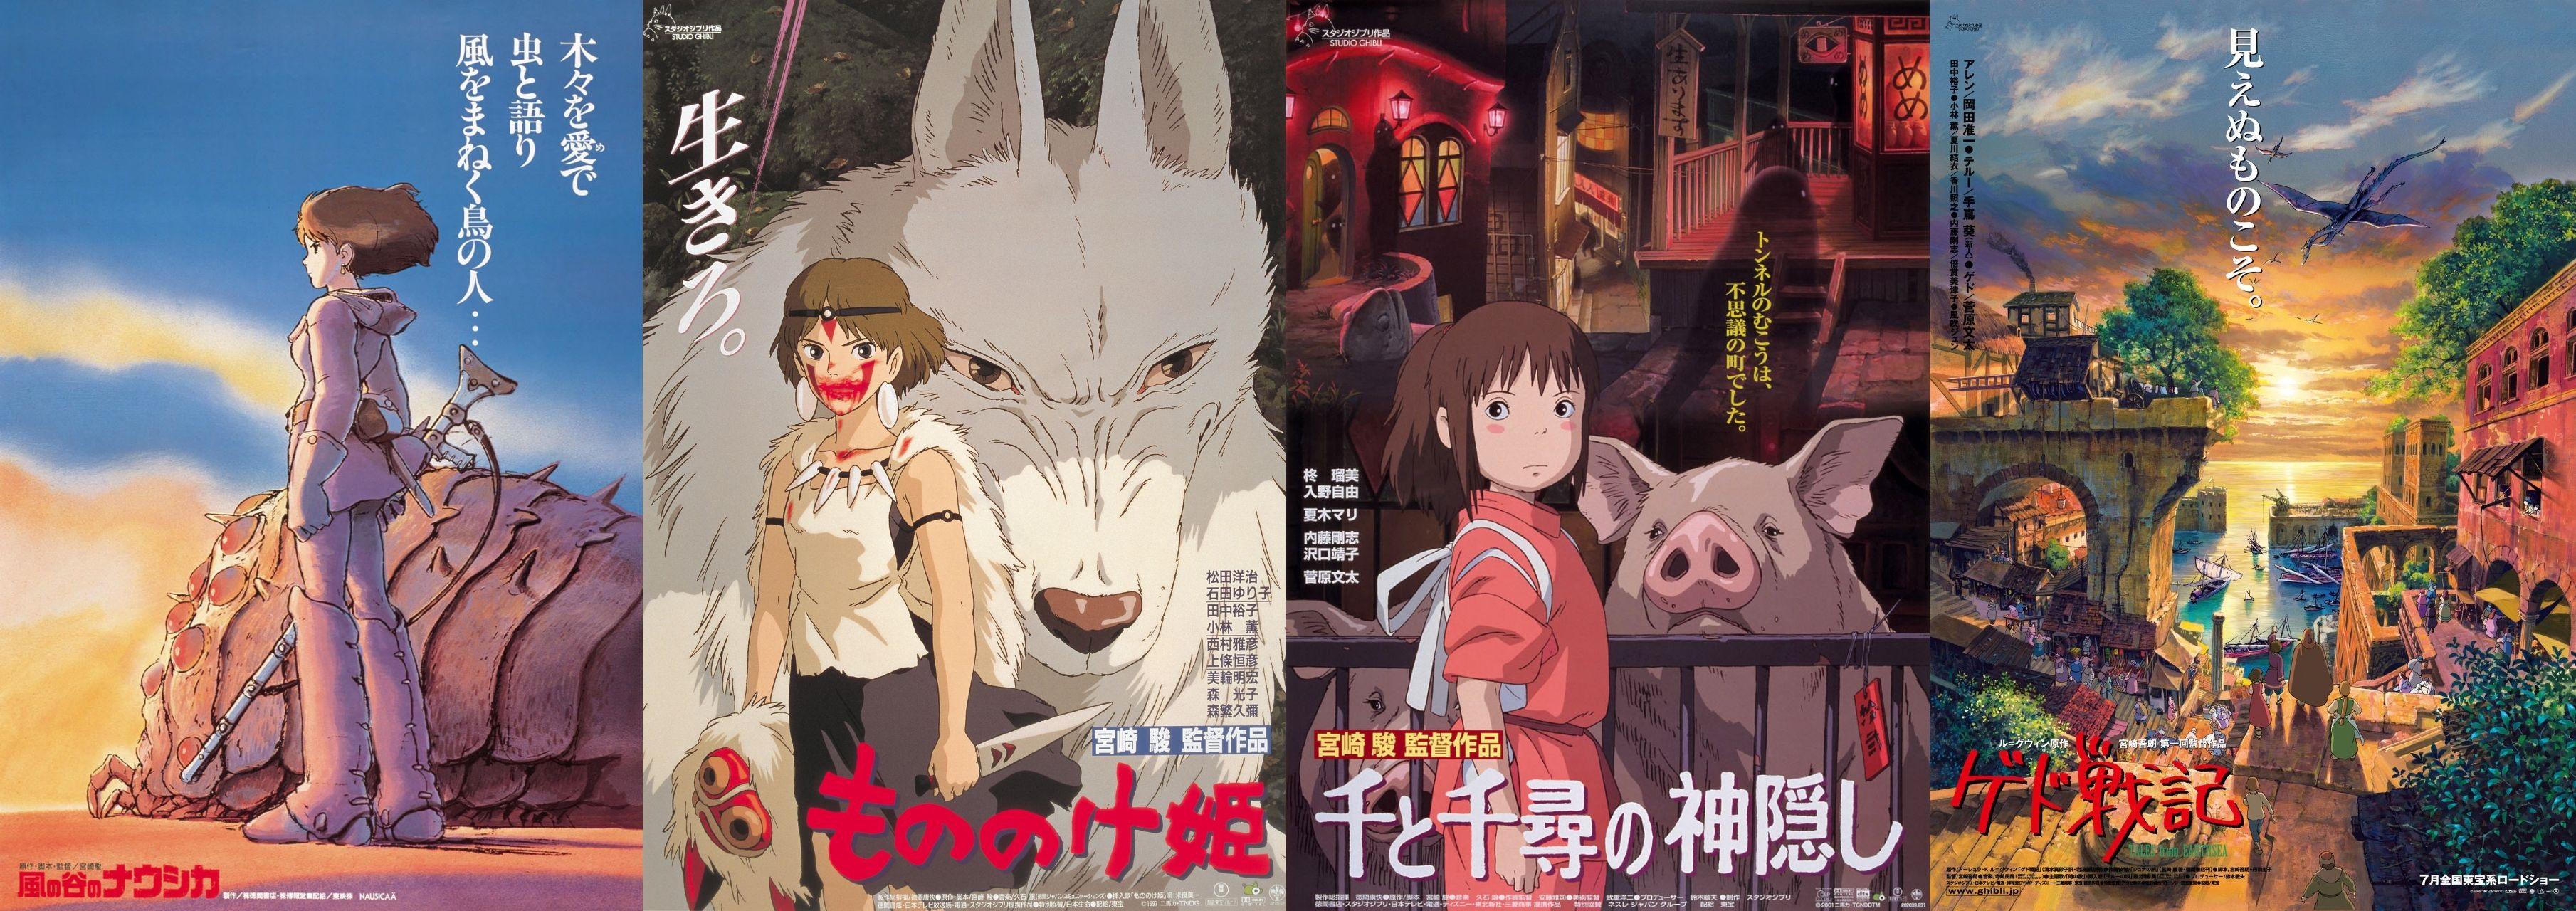 (C) 1984 Studio Ghibli・H / (C) 1997 Studio Ghibli・ND / (C) 2001 Studio Ghibli・NDDTM / (C) 2006 Studio Ghibli・NDHDMT